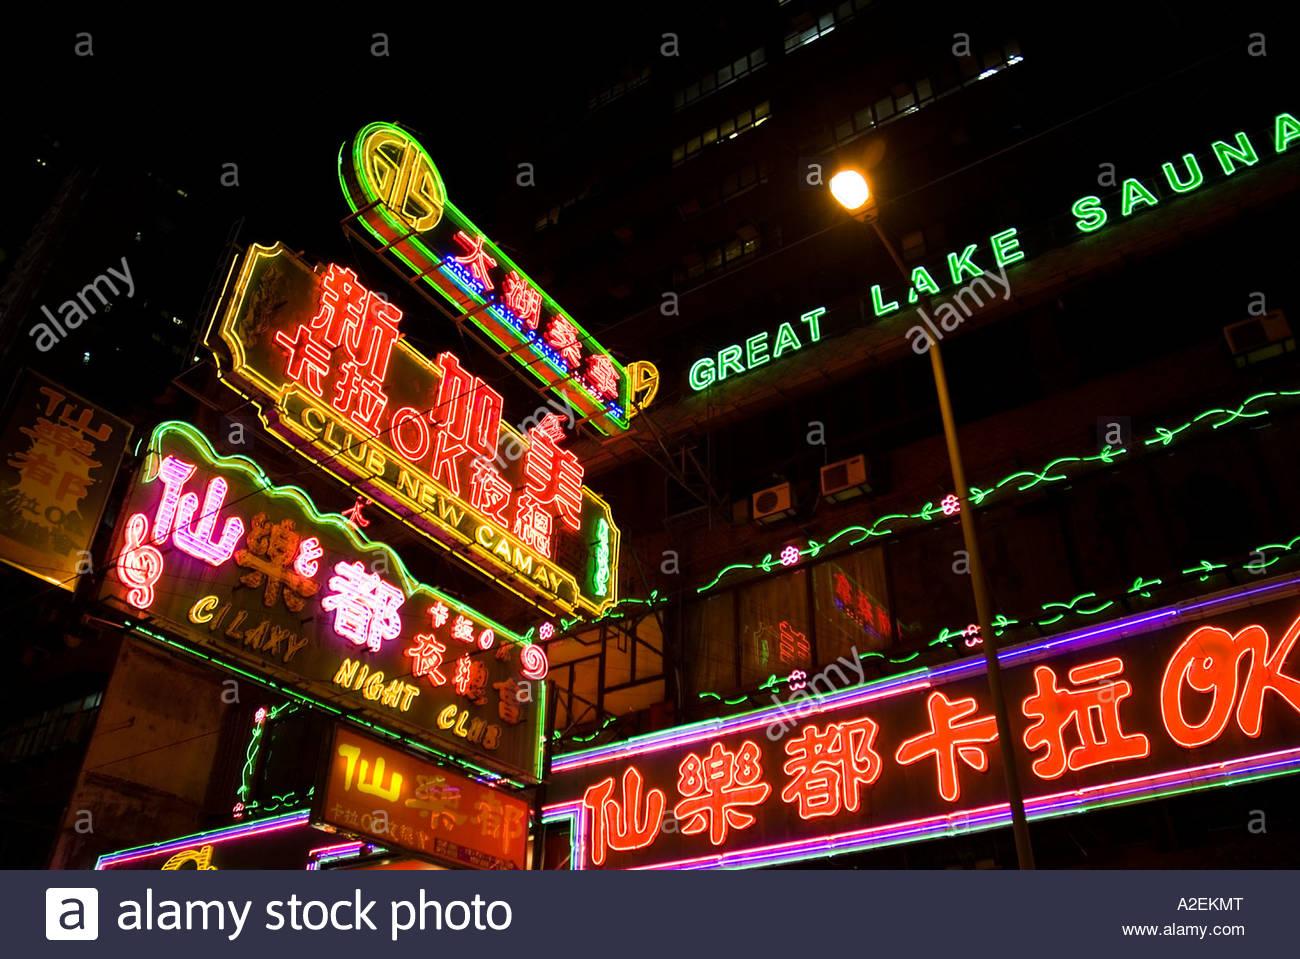 photo wanchai hong kong night club and sauna bright neon light signs